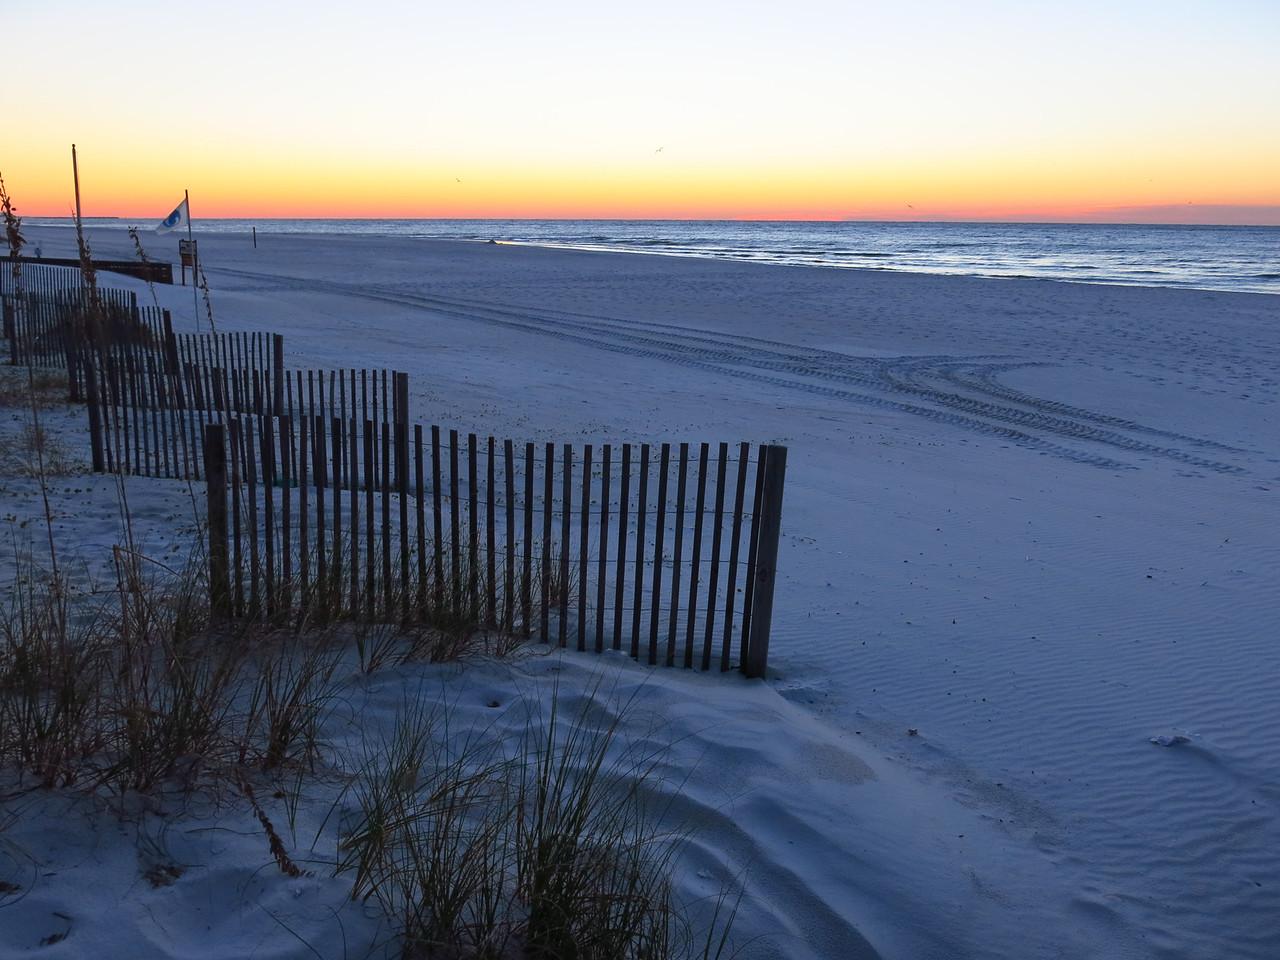 Dawn on Friday, November 8